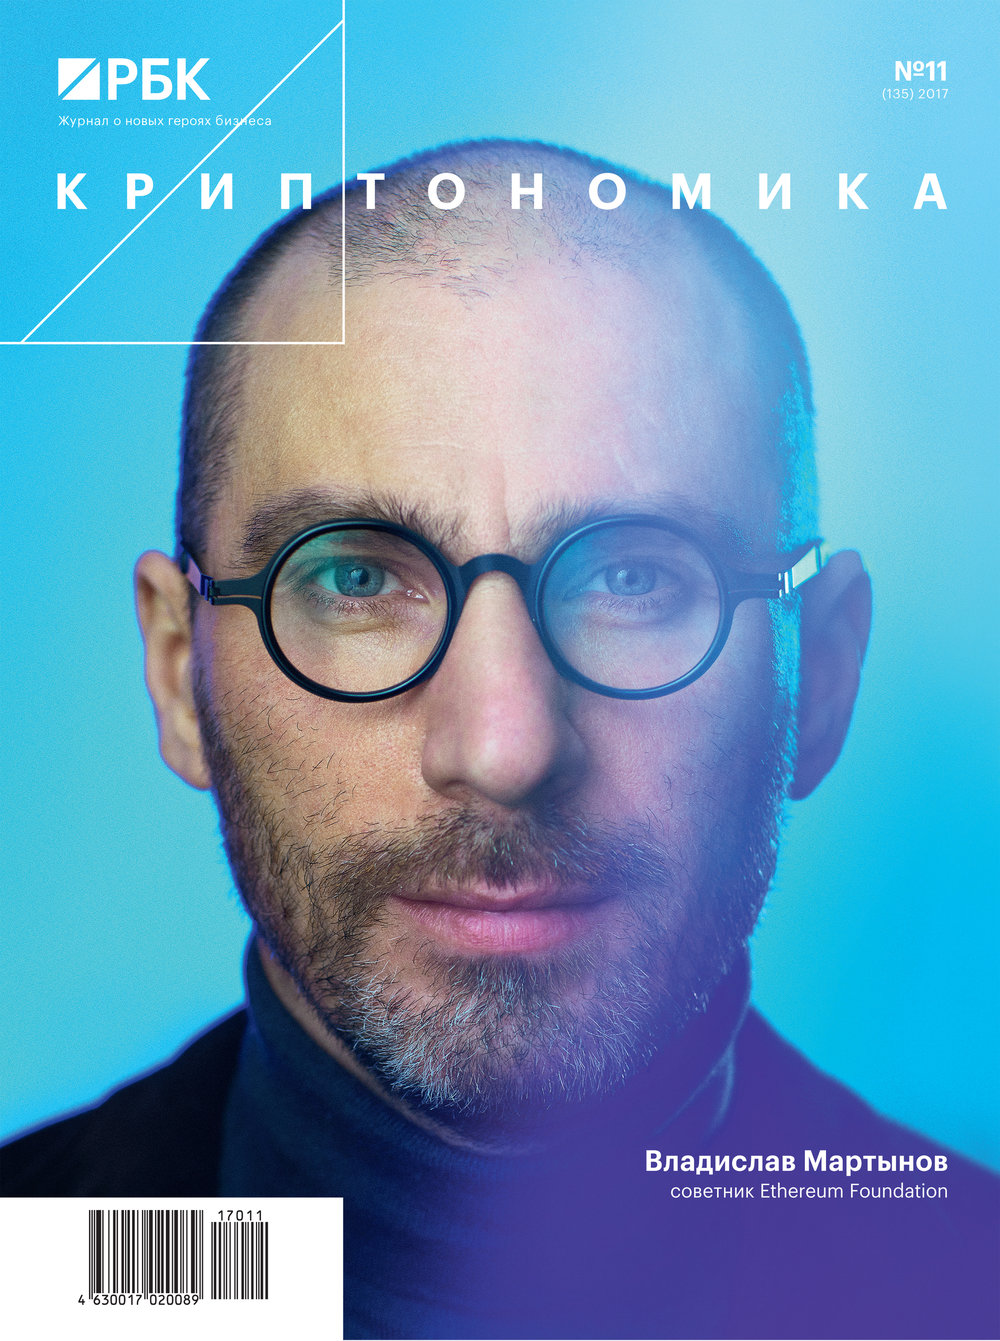 Martynov_Vlad_RBK_cover.jpg